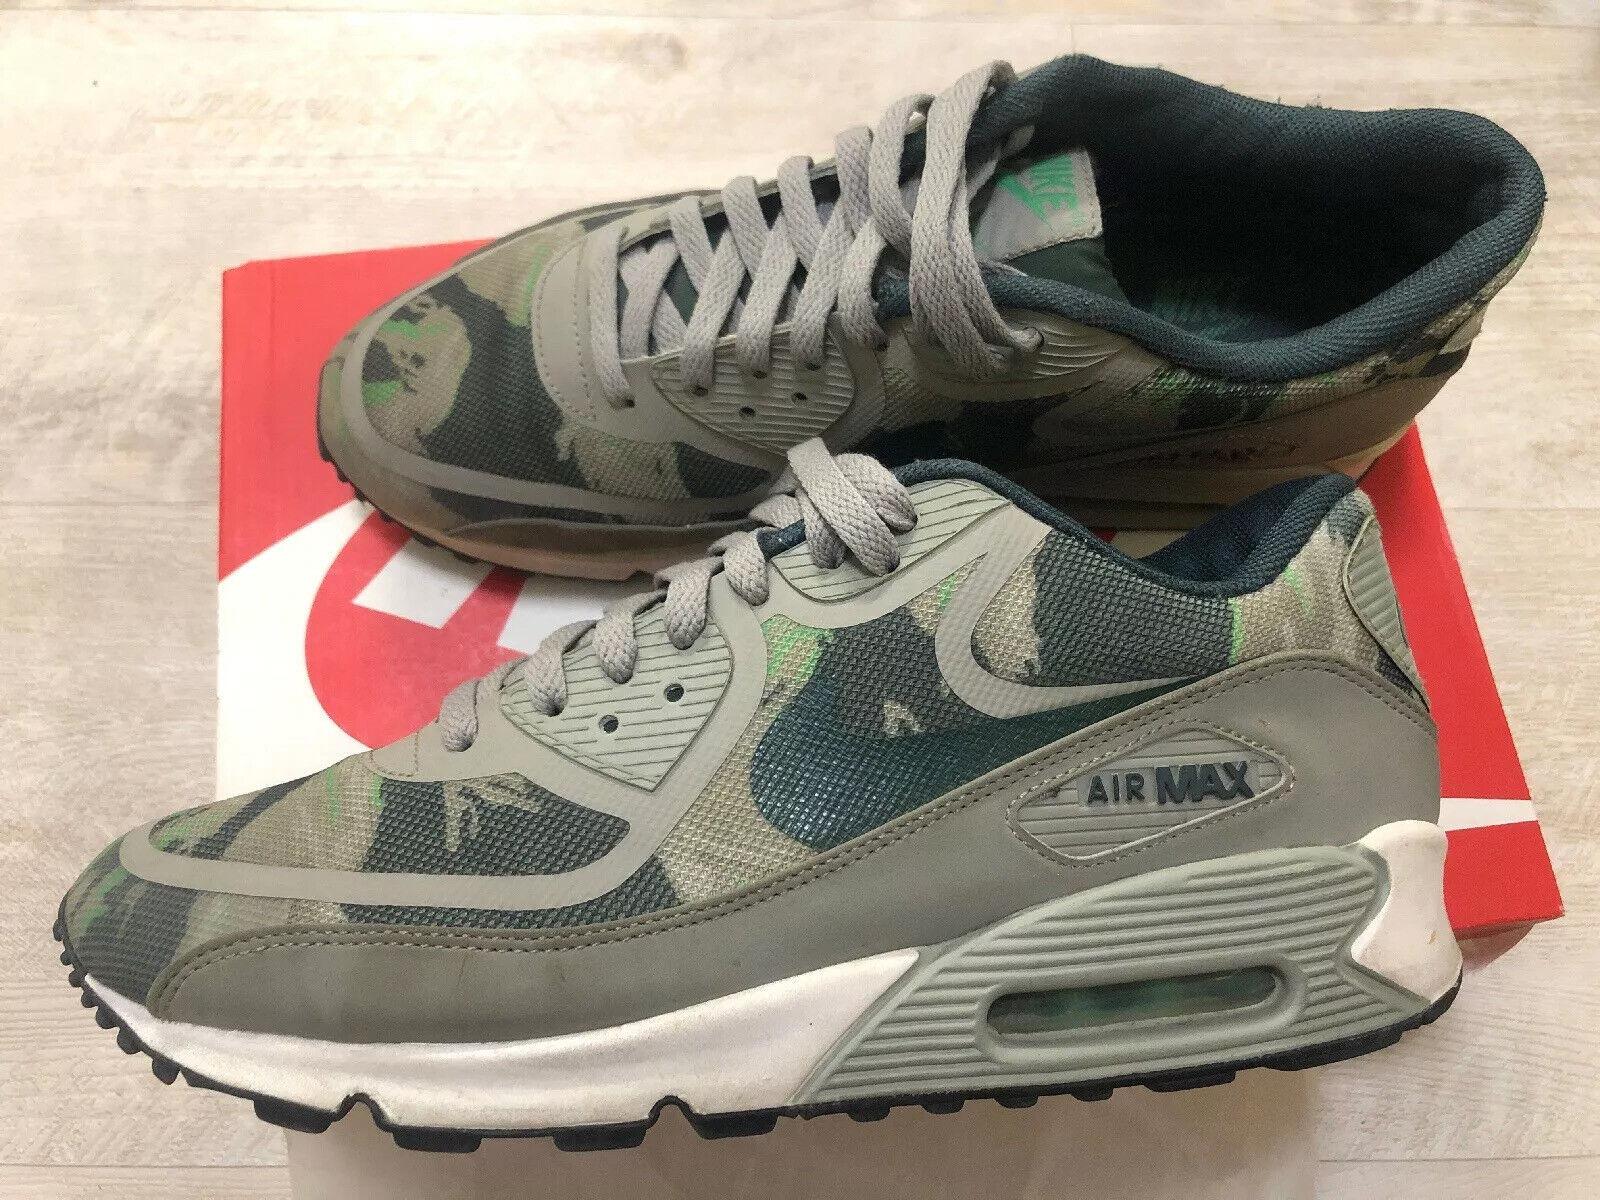 Nike Air Max 90 PRM Prem Premium Tape Sneaker Gr. 44 Camo Camouflage RAR Gamma